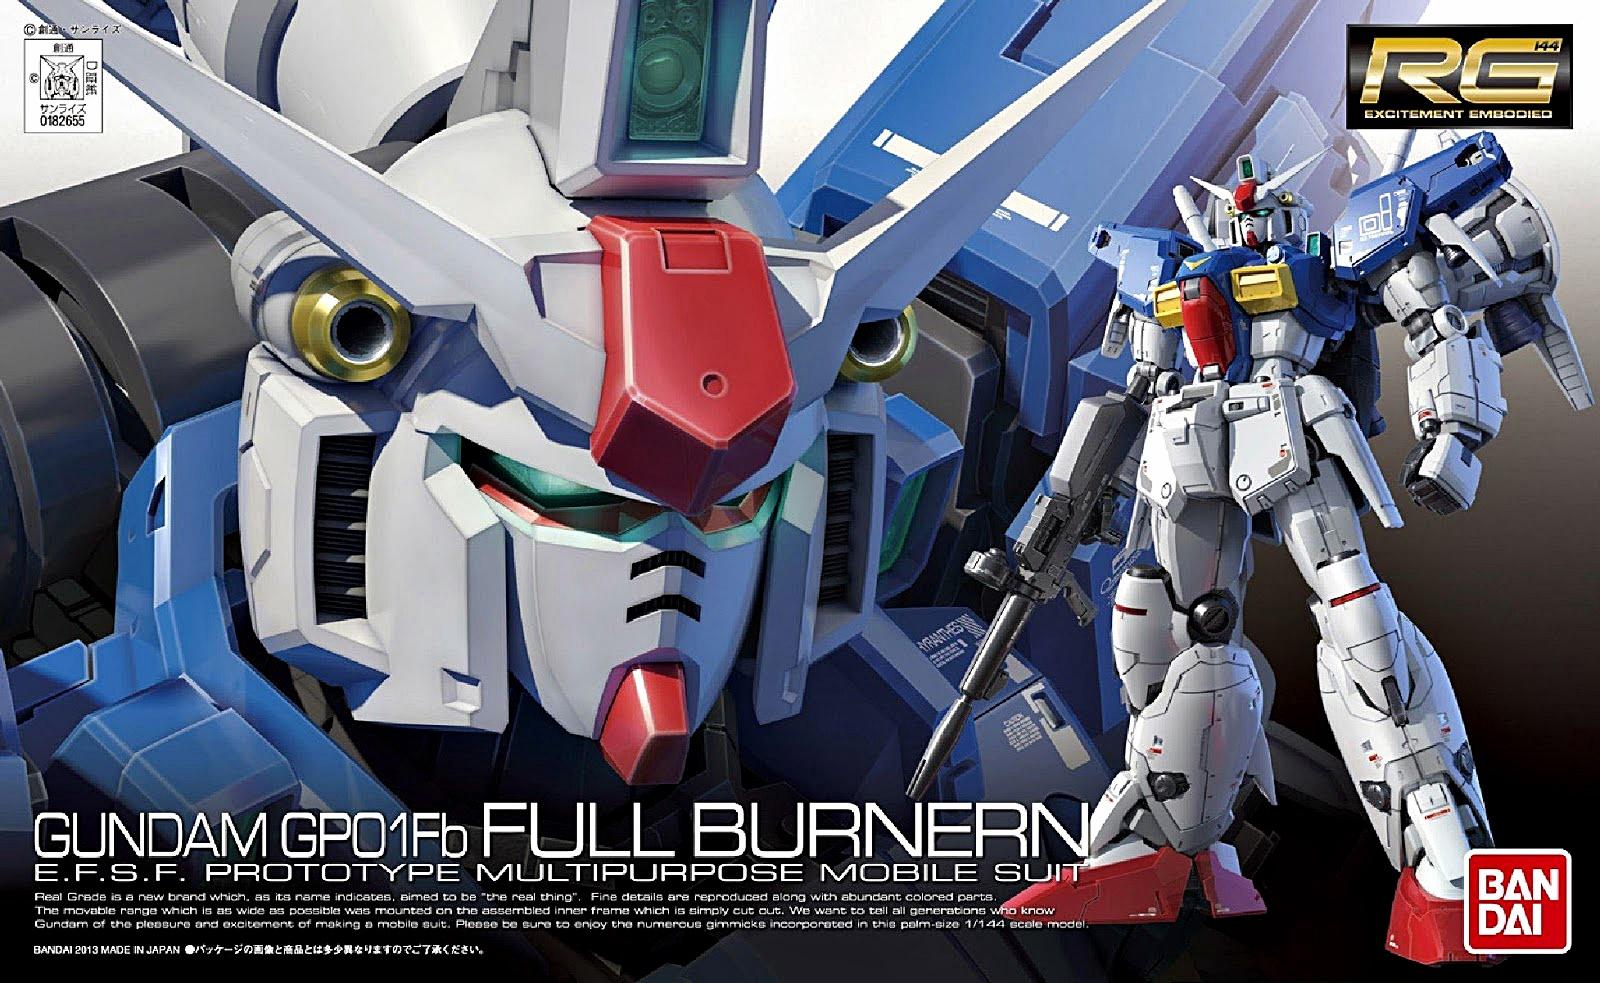 RG GUNDAM GP01Fb FULL BURNERN